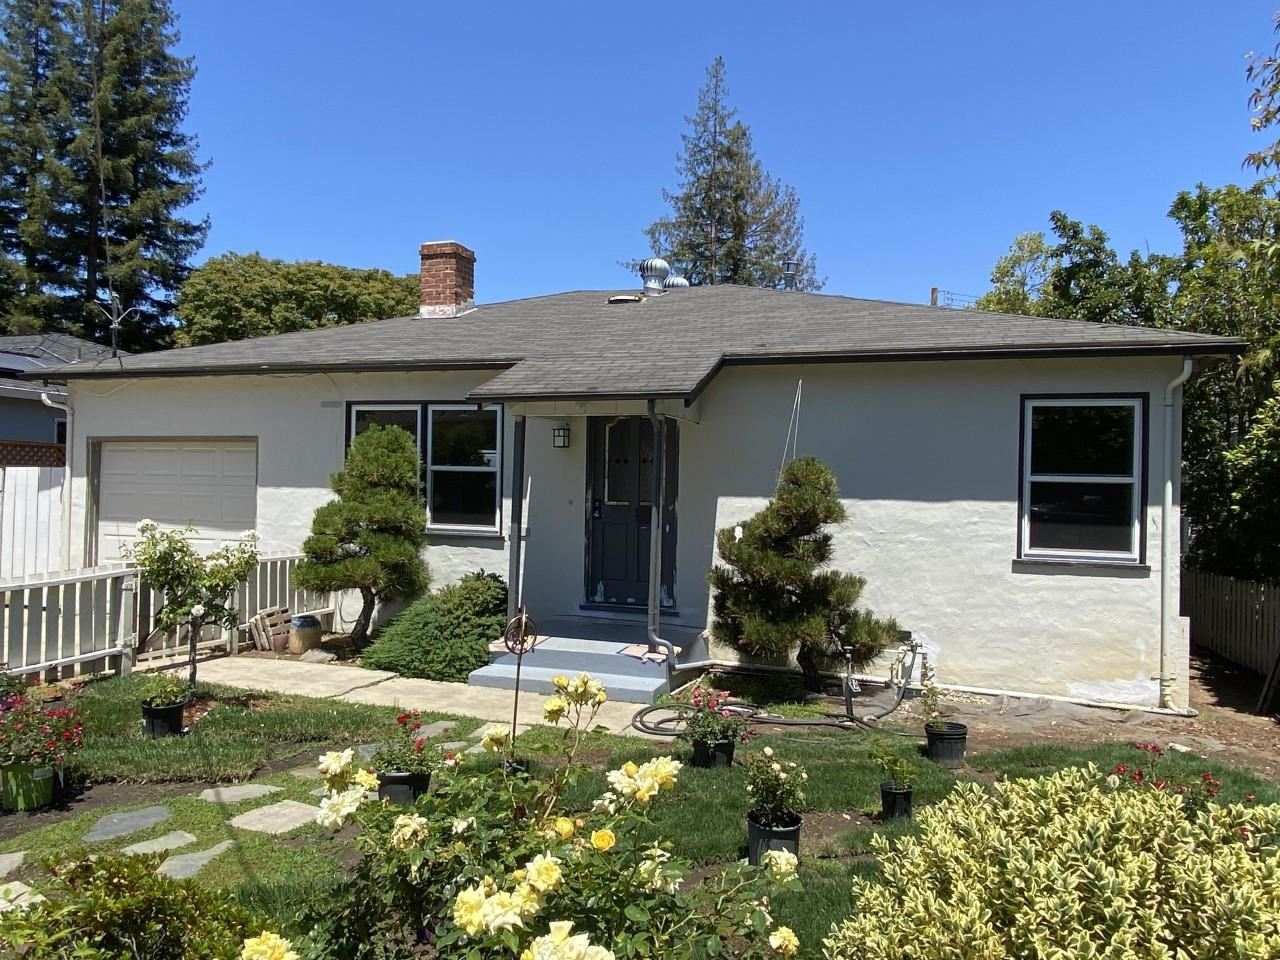 Photo for 1420 Franks Lane, MENLO PARK, CA 94025 (MLS # ML81854530)